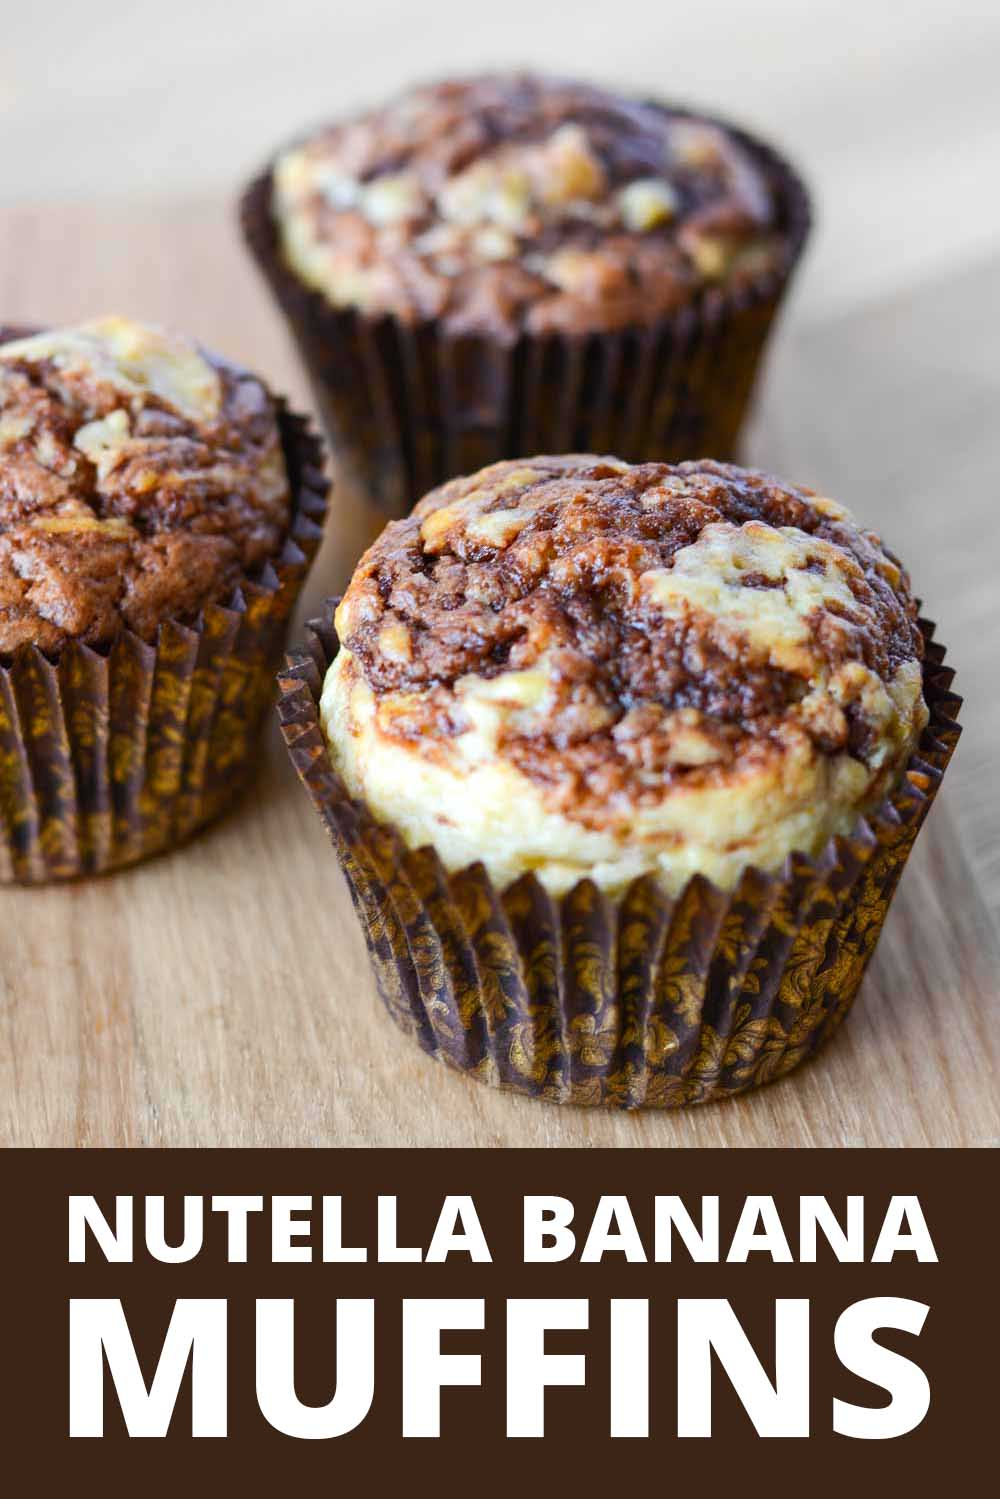 Banana nutella muffins recipe